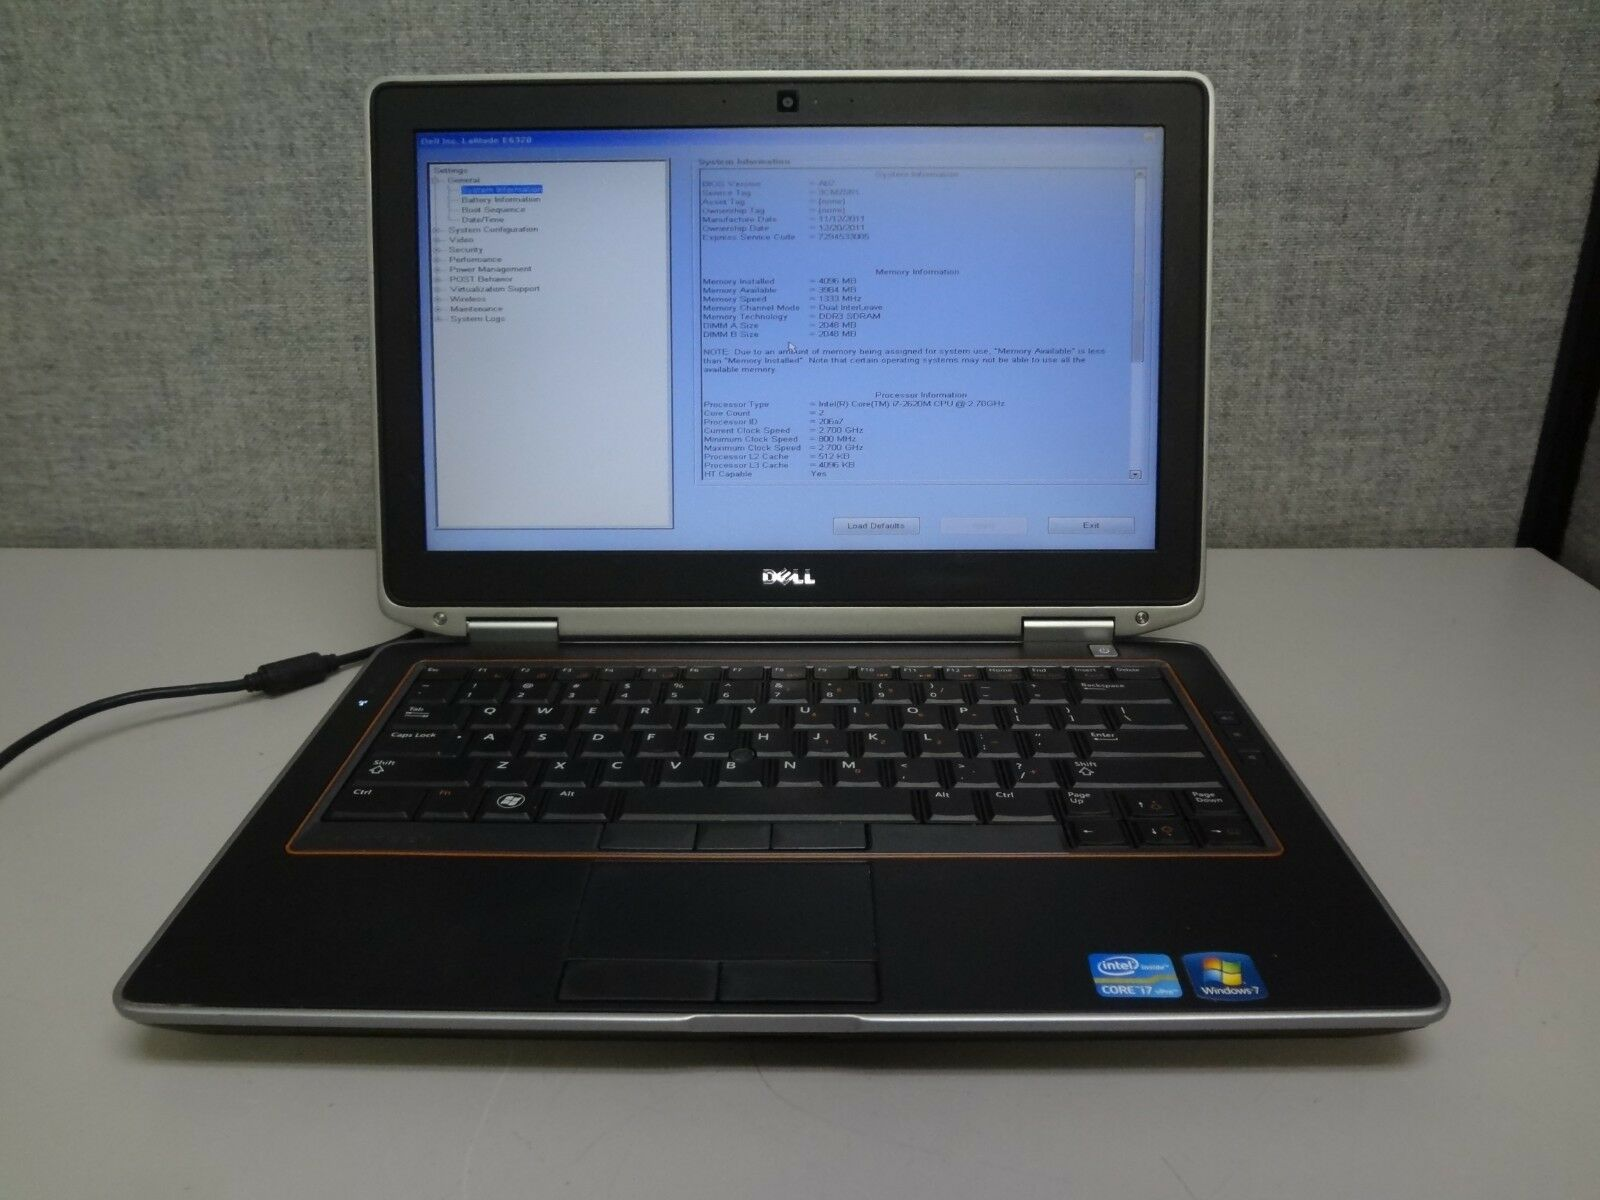 "Dell E6320 13.3"" Core i7 2.7GHz 4GB/160GB Webcam Linux Laptop ""No Battery"" + AC"